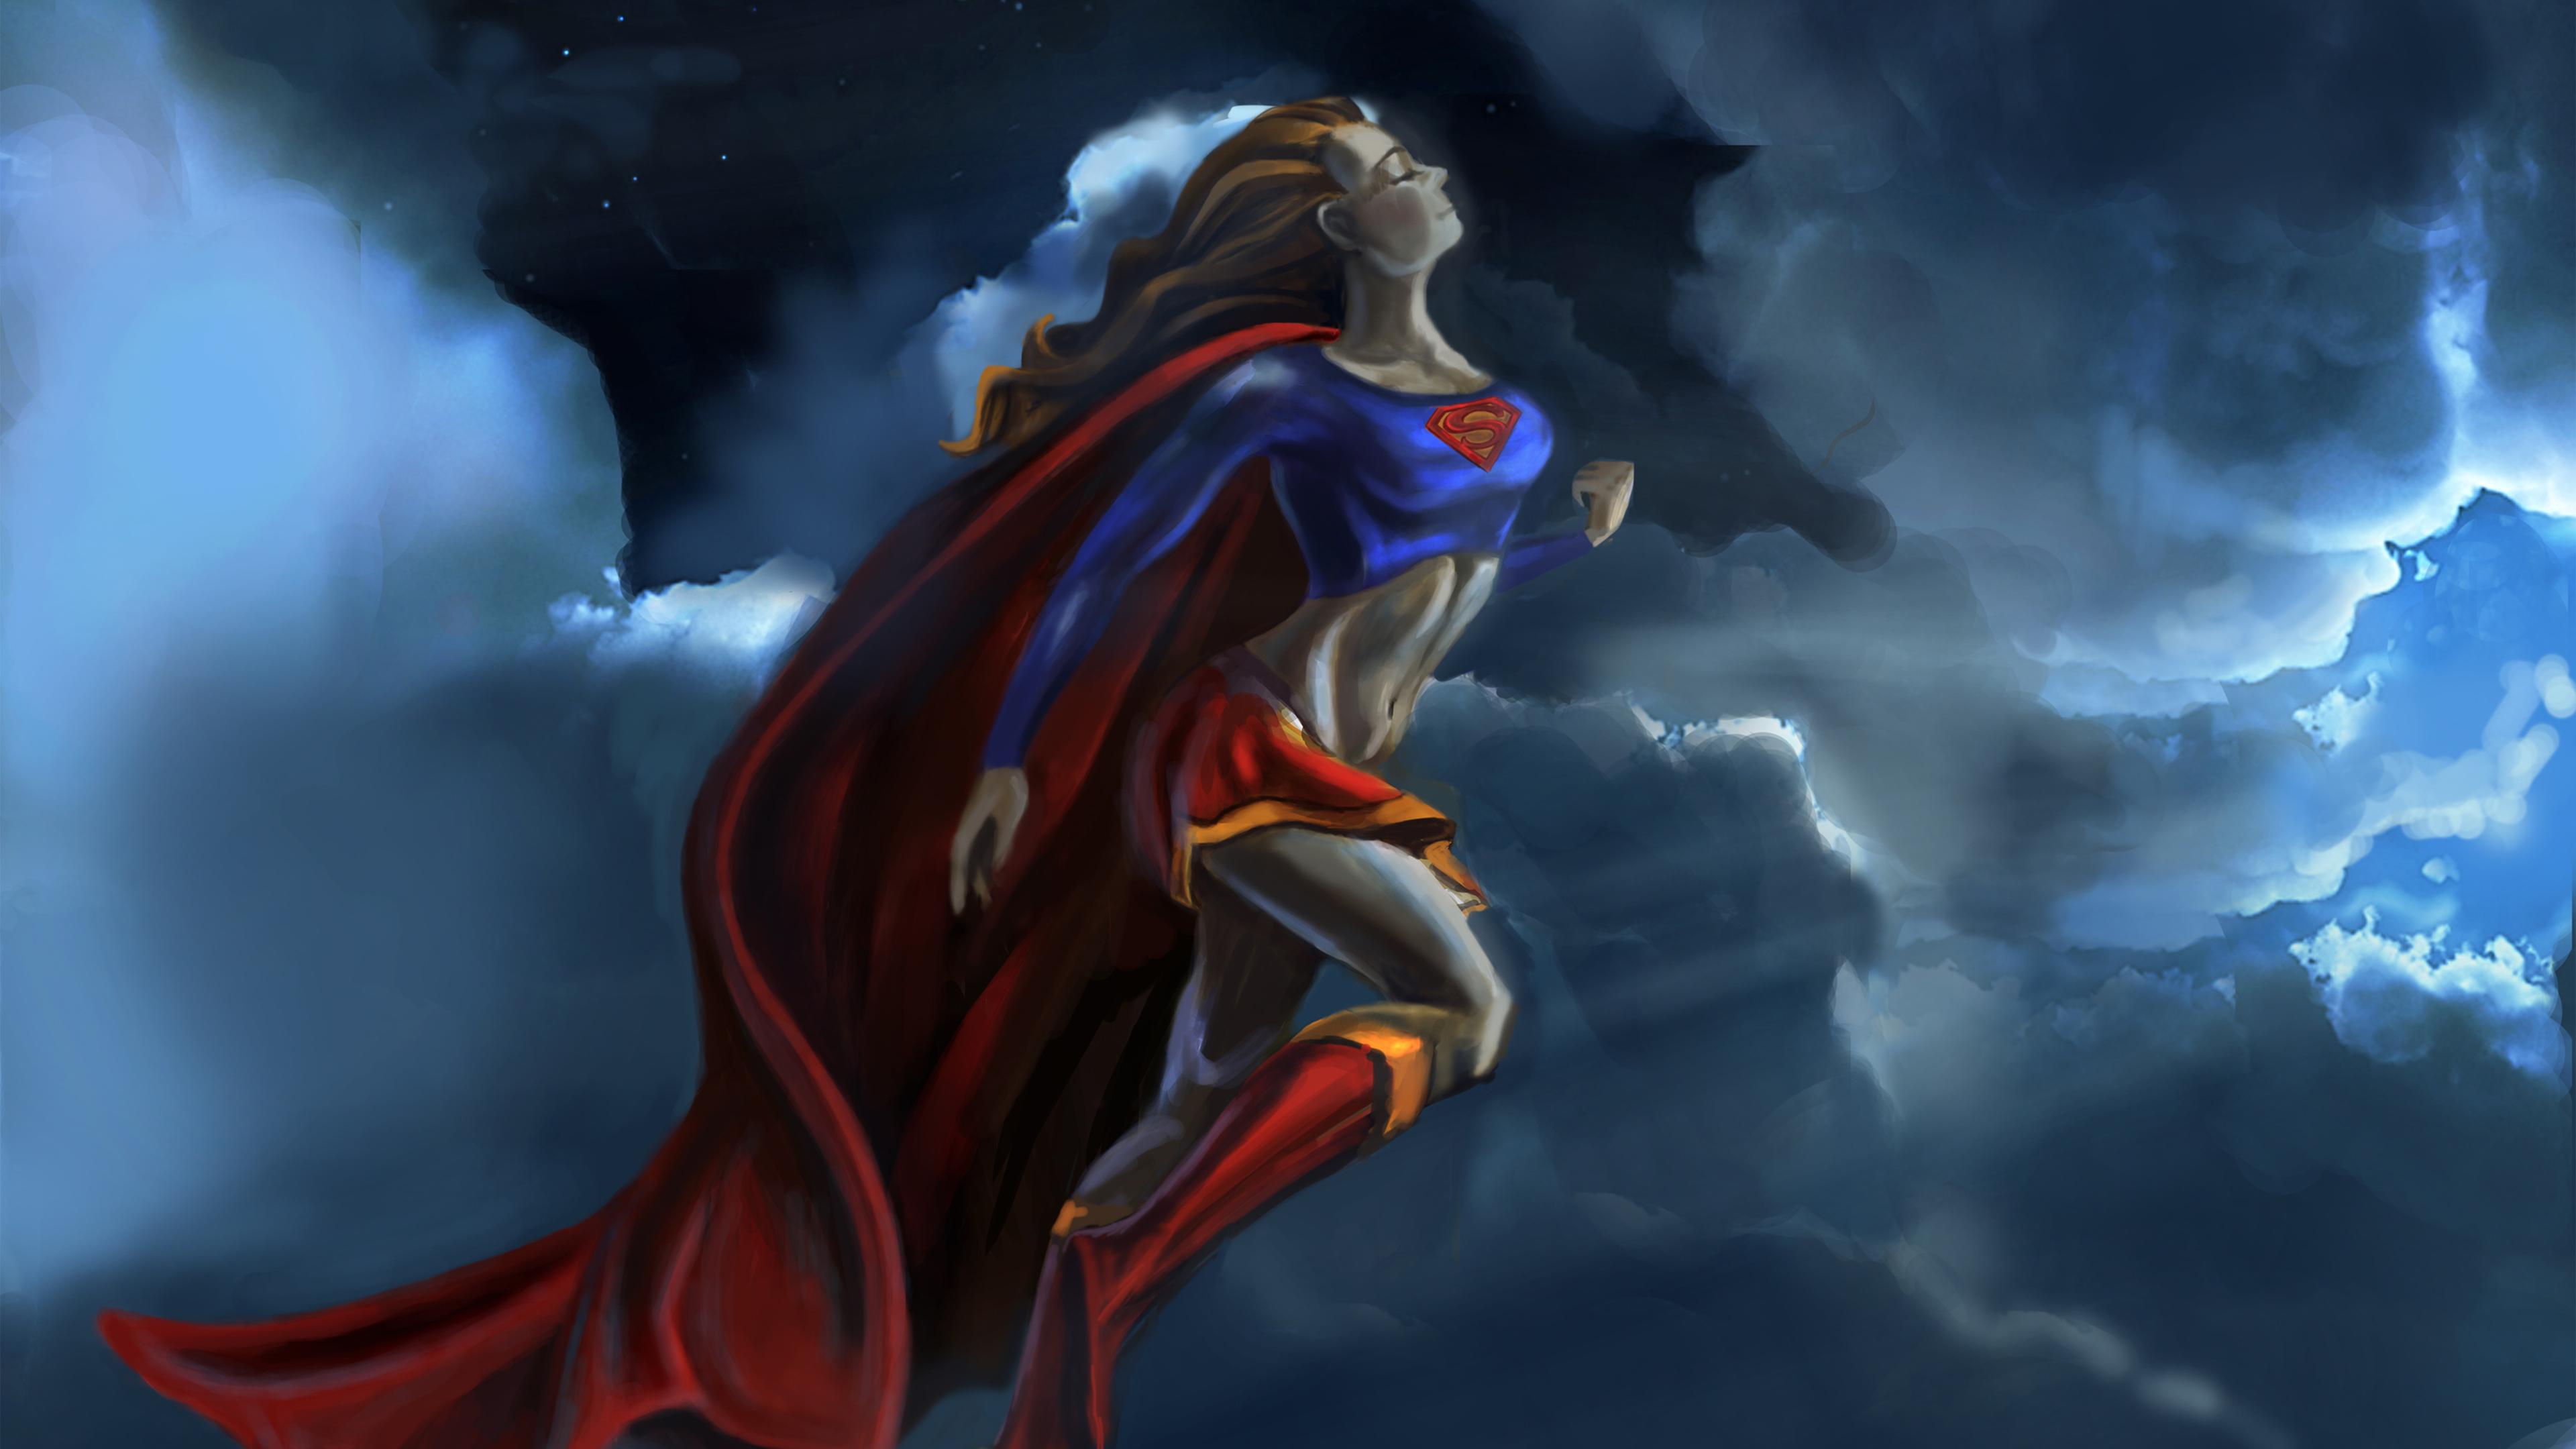 2048x2048 Game Girl Pubg 4k Ipad Air Hd 4k Wallpapers: Supergirl In The Air 4K Art Superheroes Wallpapers